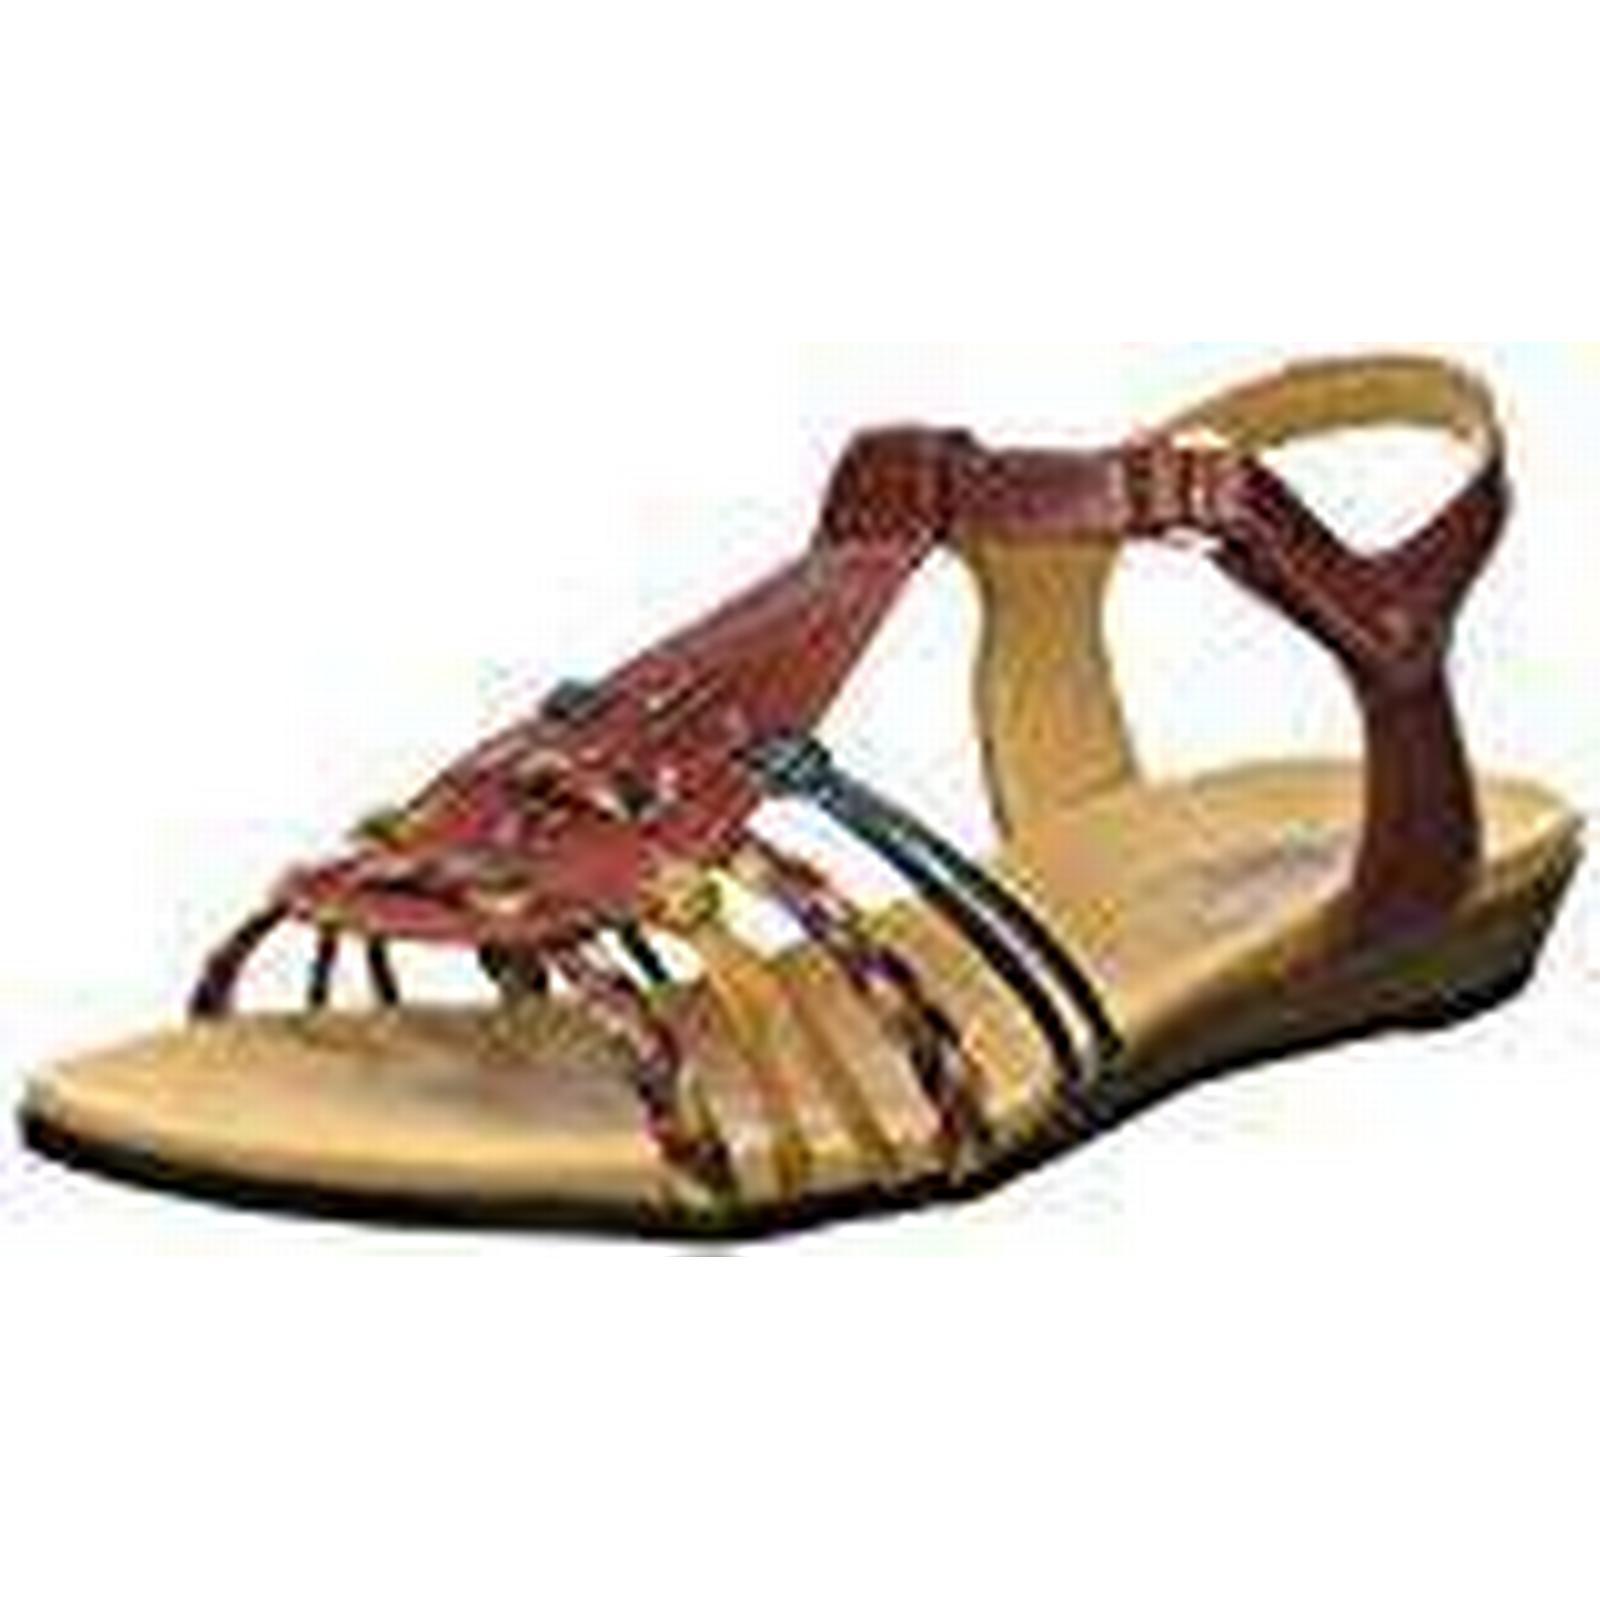 Pikolinos Women's Alcudia 816 T-Bar UK Sandals, Red (Sandia), 9 UK T-Bar 656255